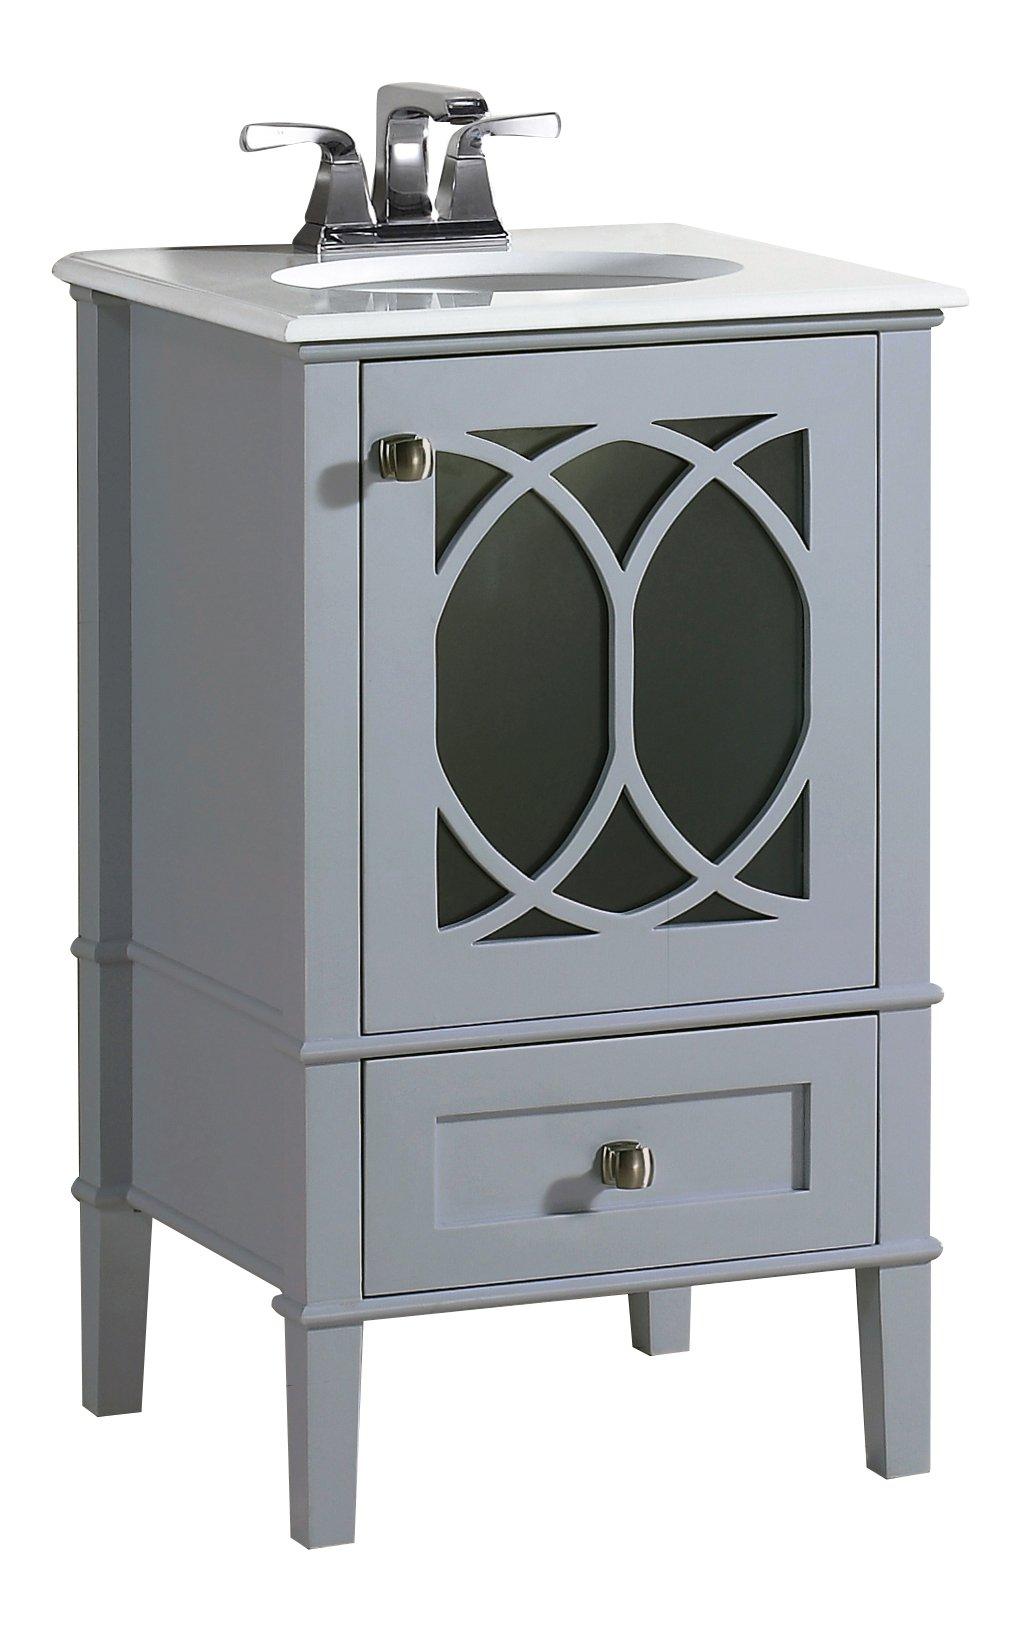 20 inch bathroom vanity. Black Bedroom Furniture Sets. Home Design Ideas